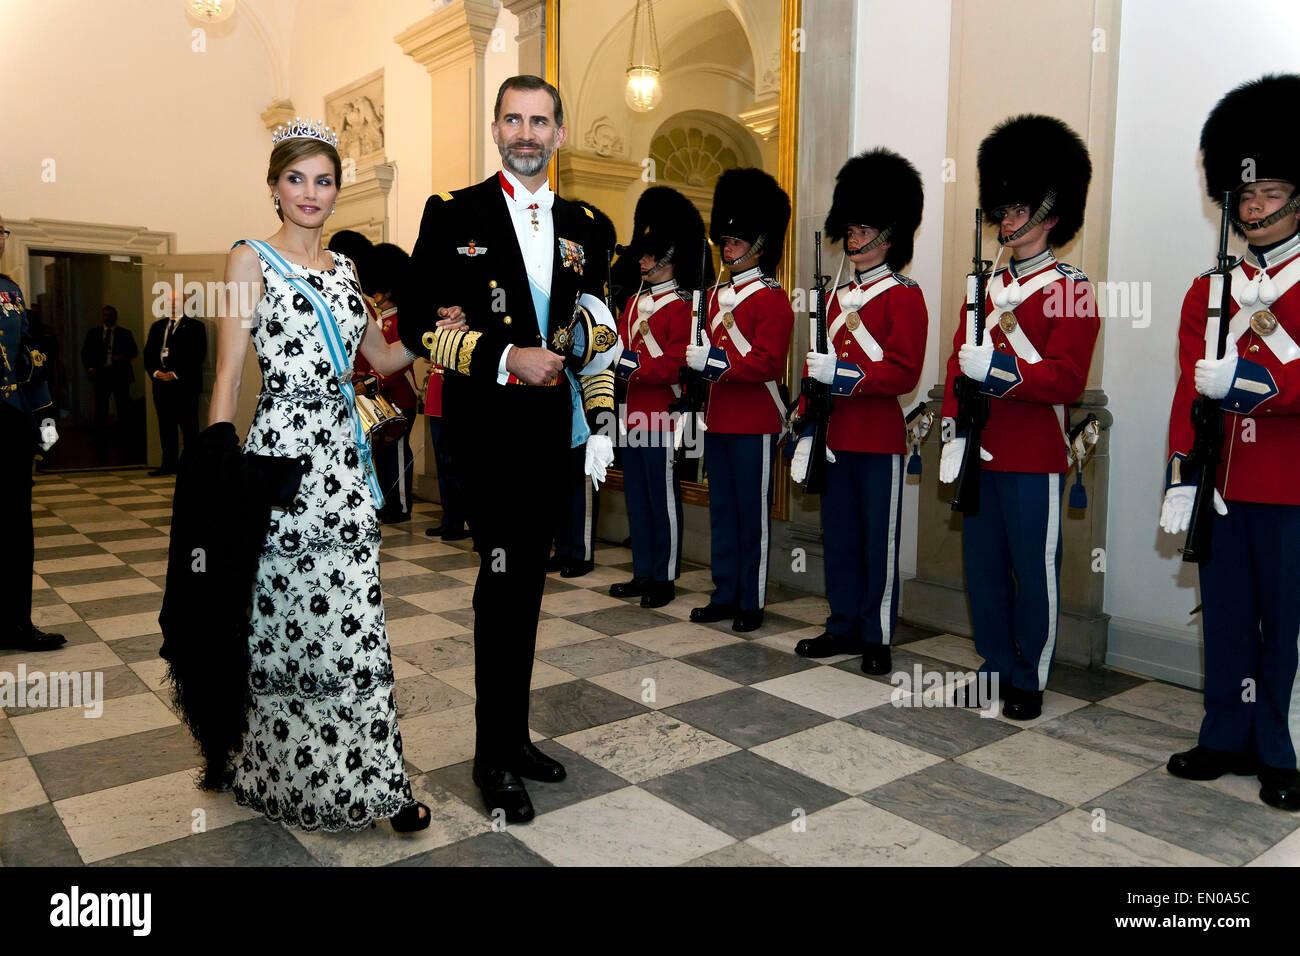 Copenhagen, Denmark, April15th, 2015. H. M. Spanish King Felipe and Queen Letizia arrive to Christiansborg for participating - Stock Image